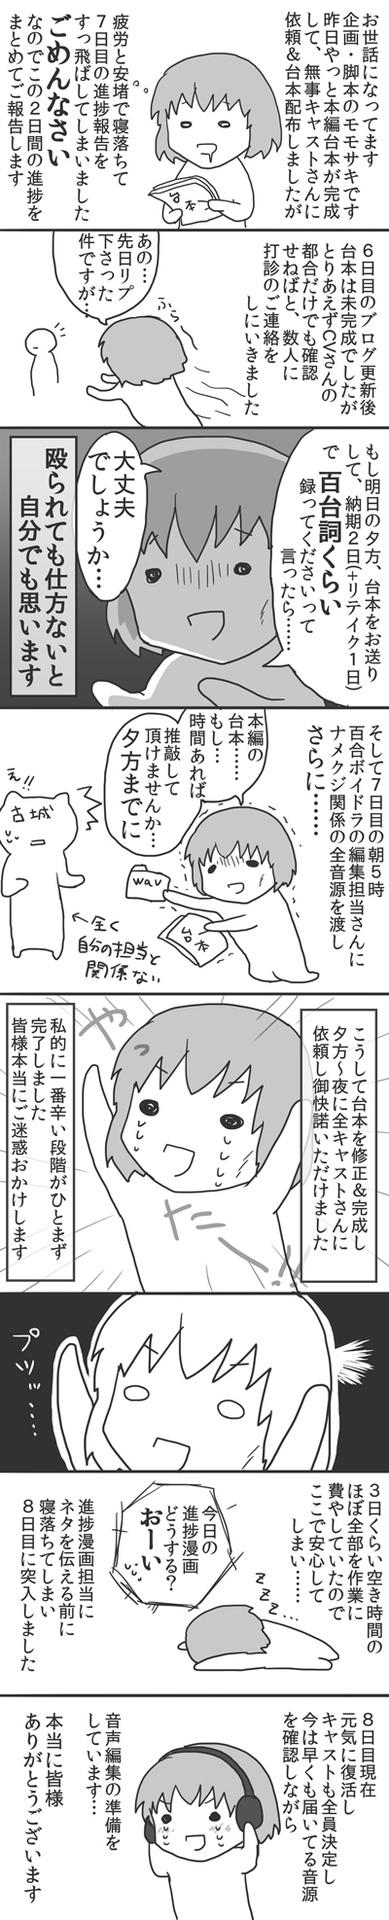 08_pic.jpg